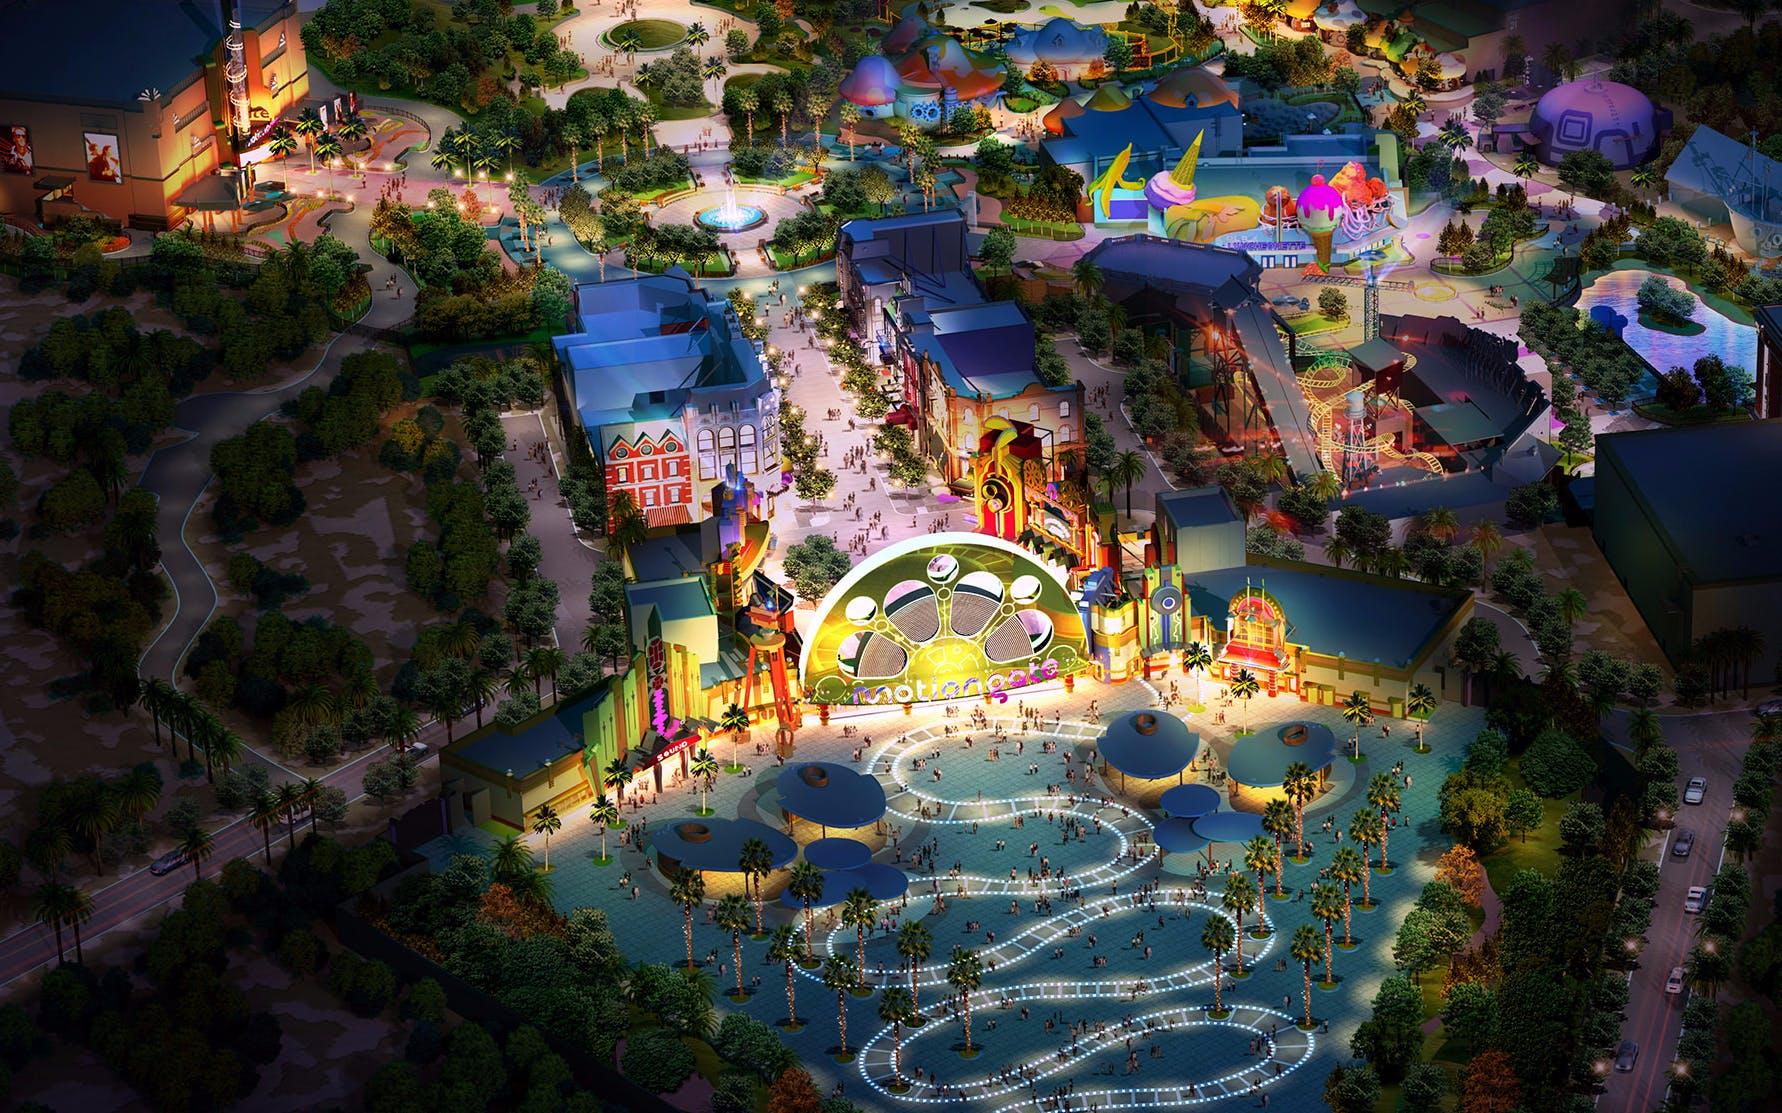 Best Theme Parks in Dubai - Motiongate Dubai - 2